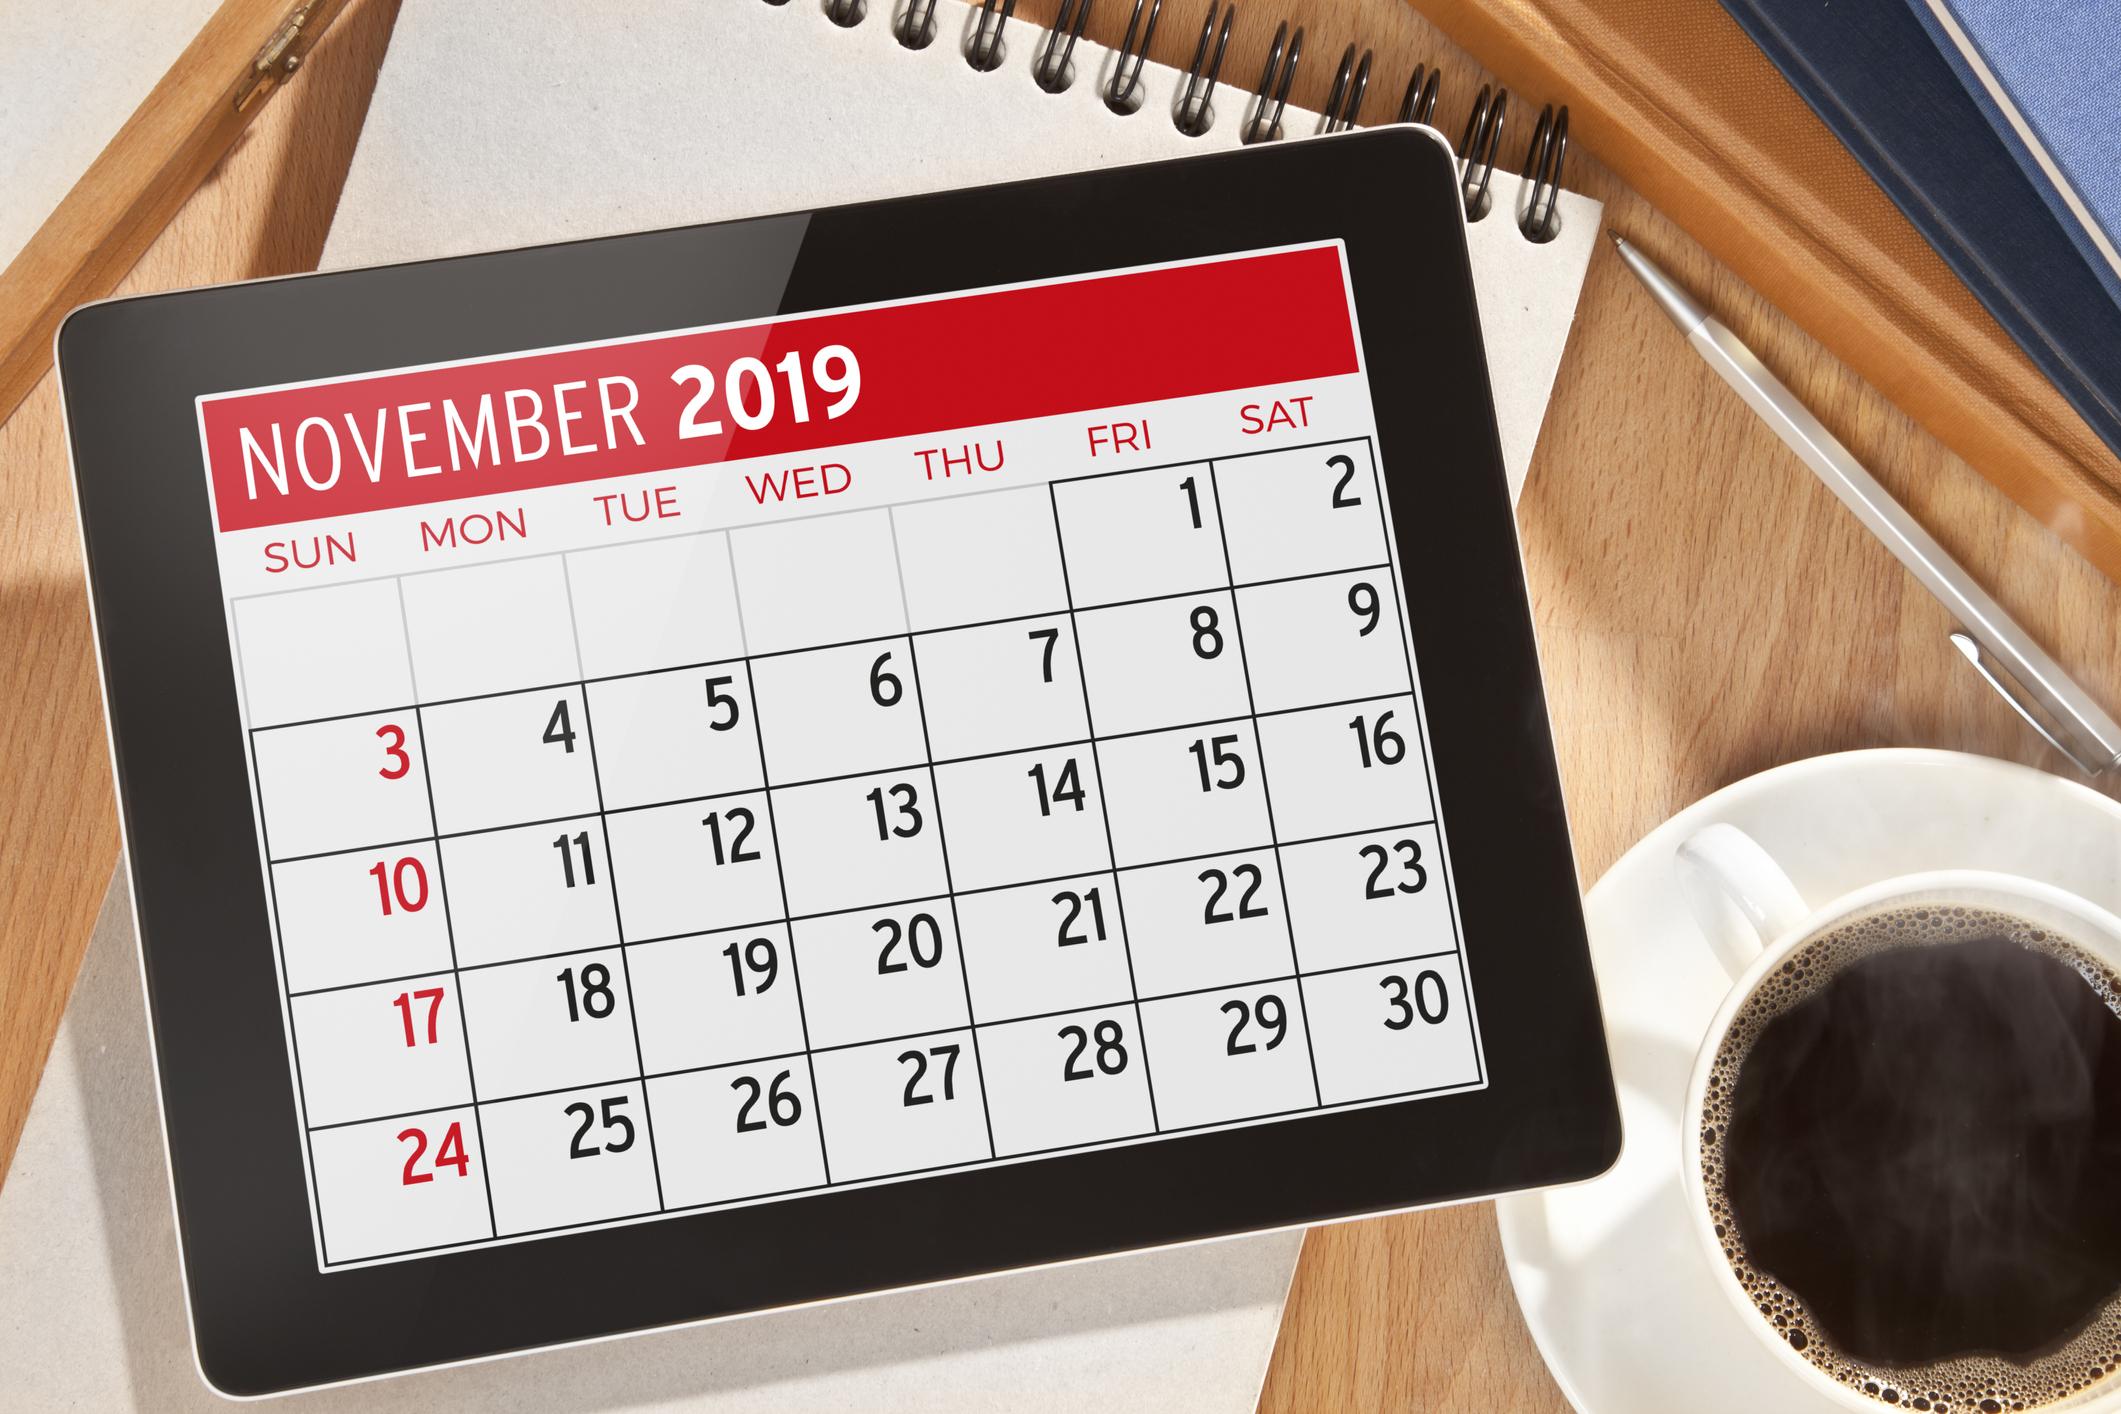 November 2019 Calendar on digital tablet display